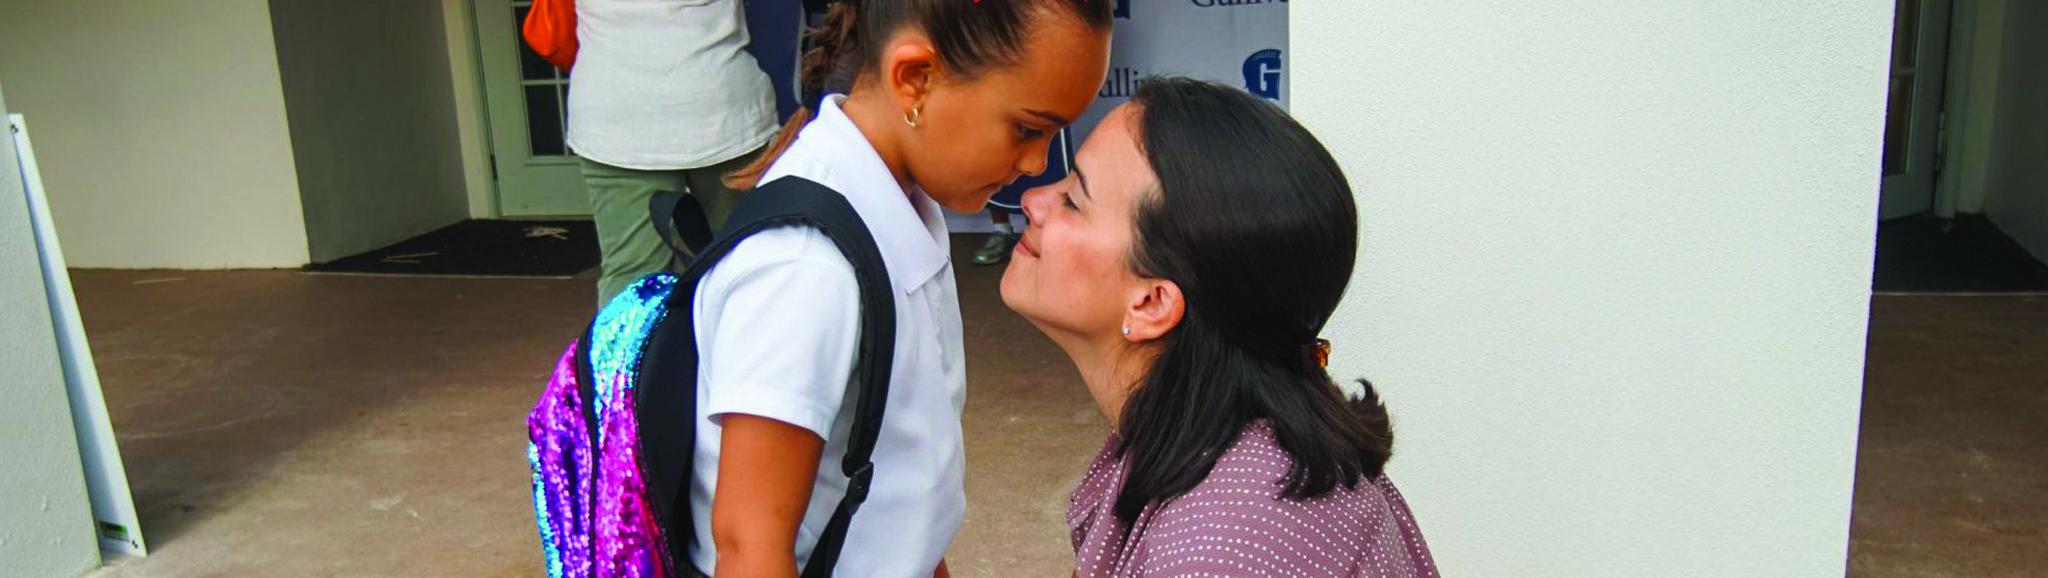 Mother daughter at school drop-off